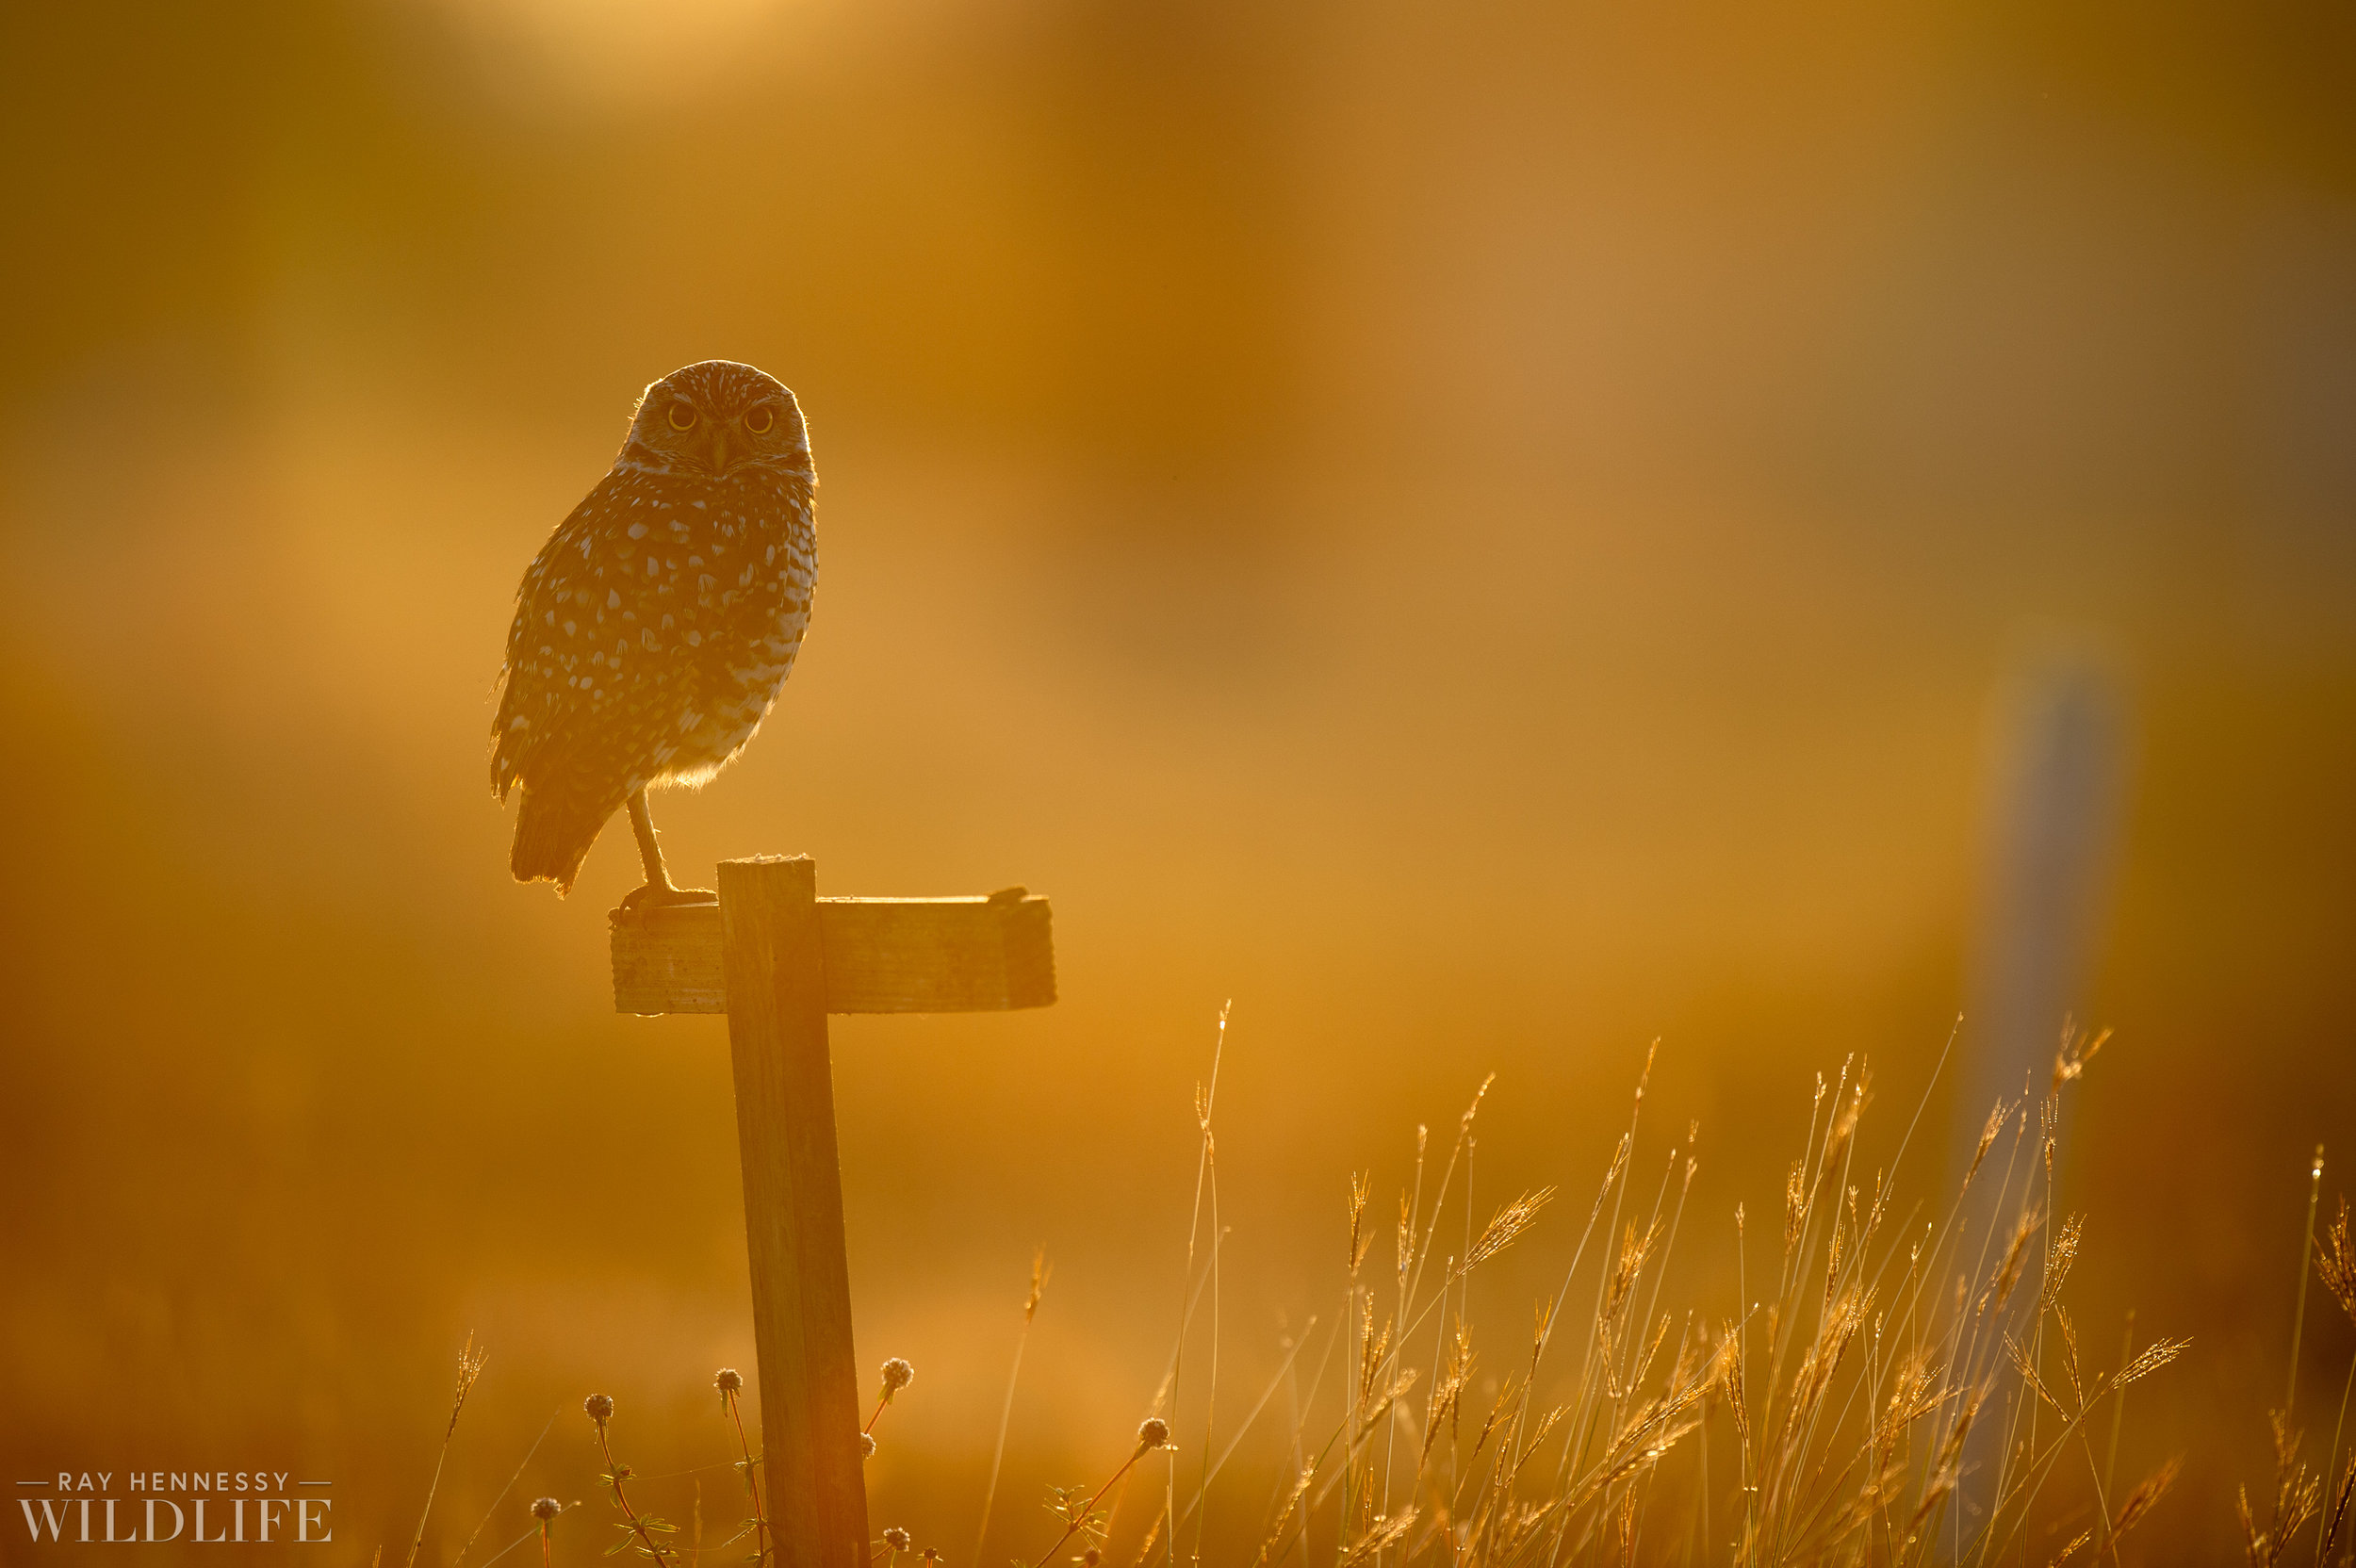 004_burrowing-owls-blue-heron-florida.jpg